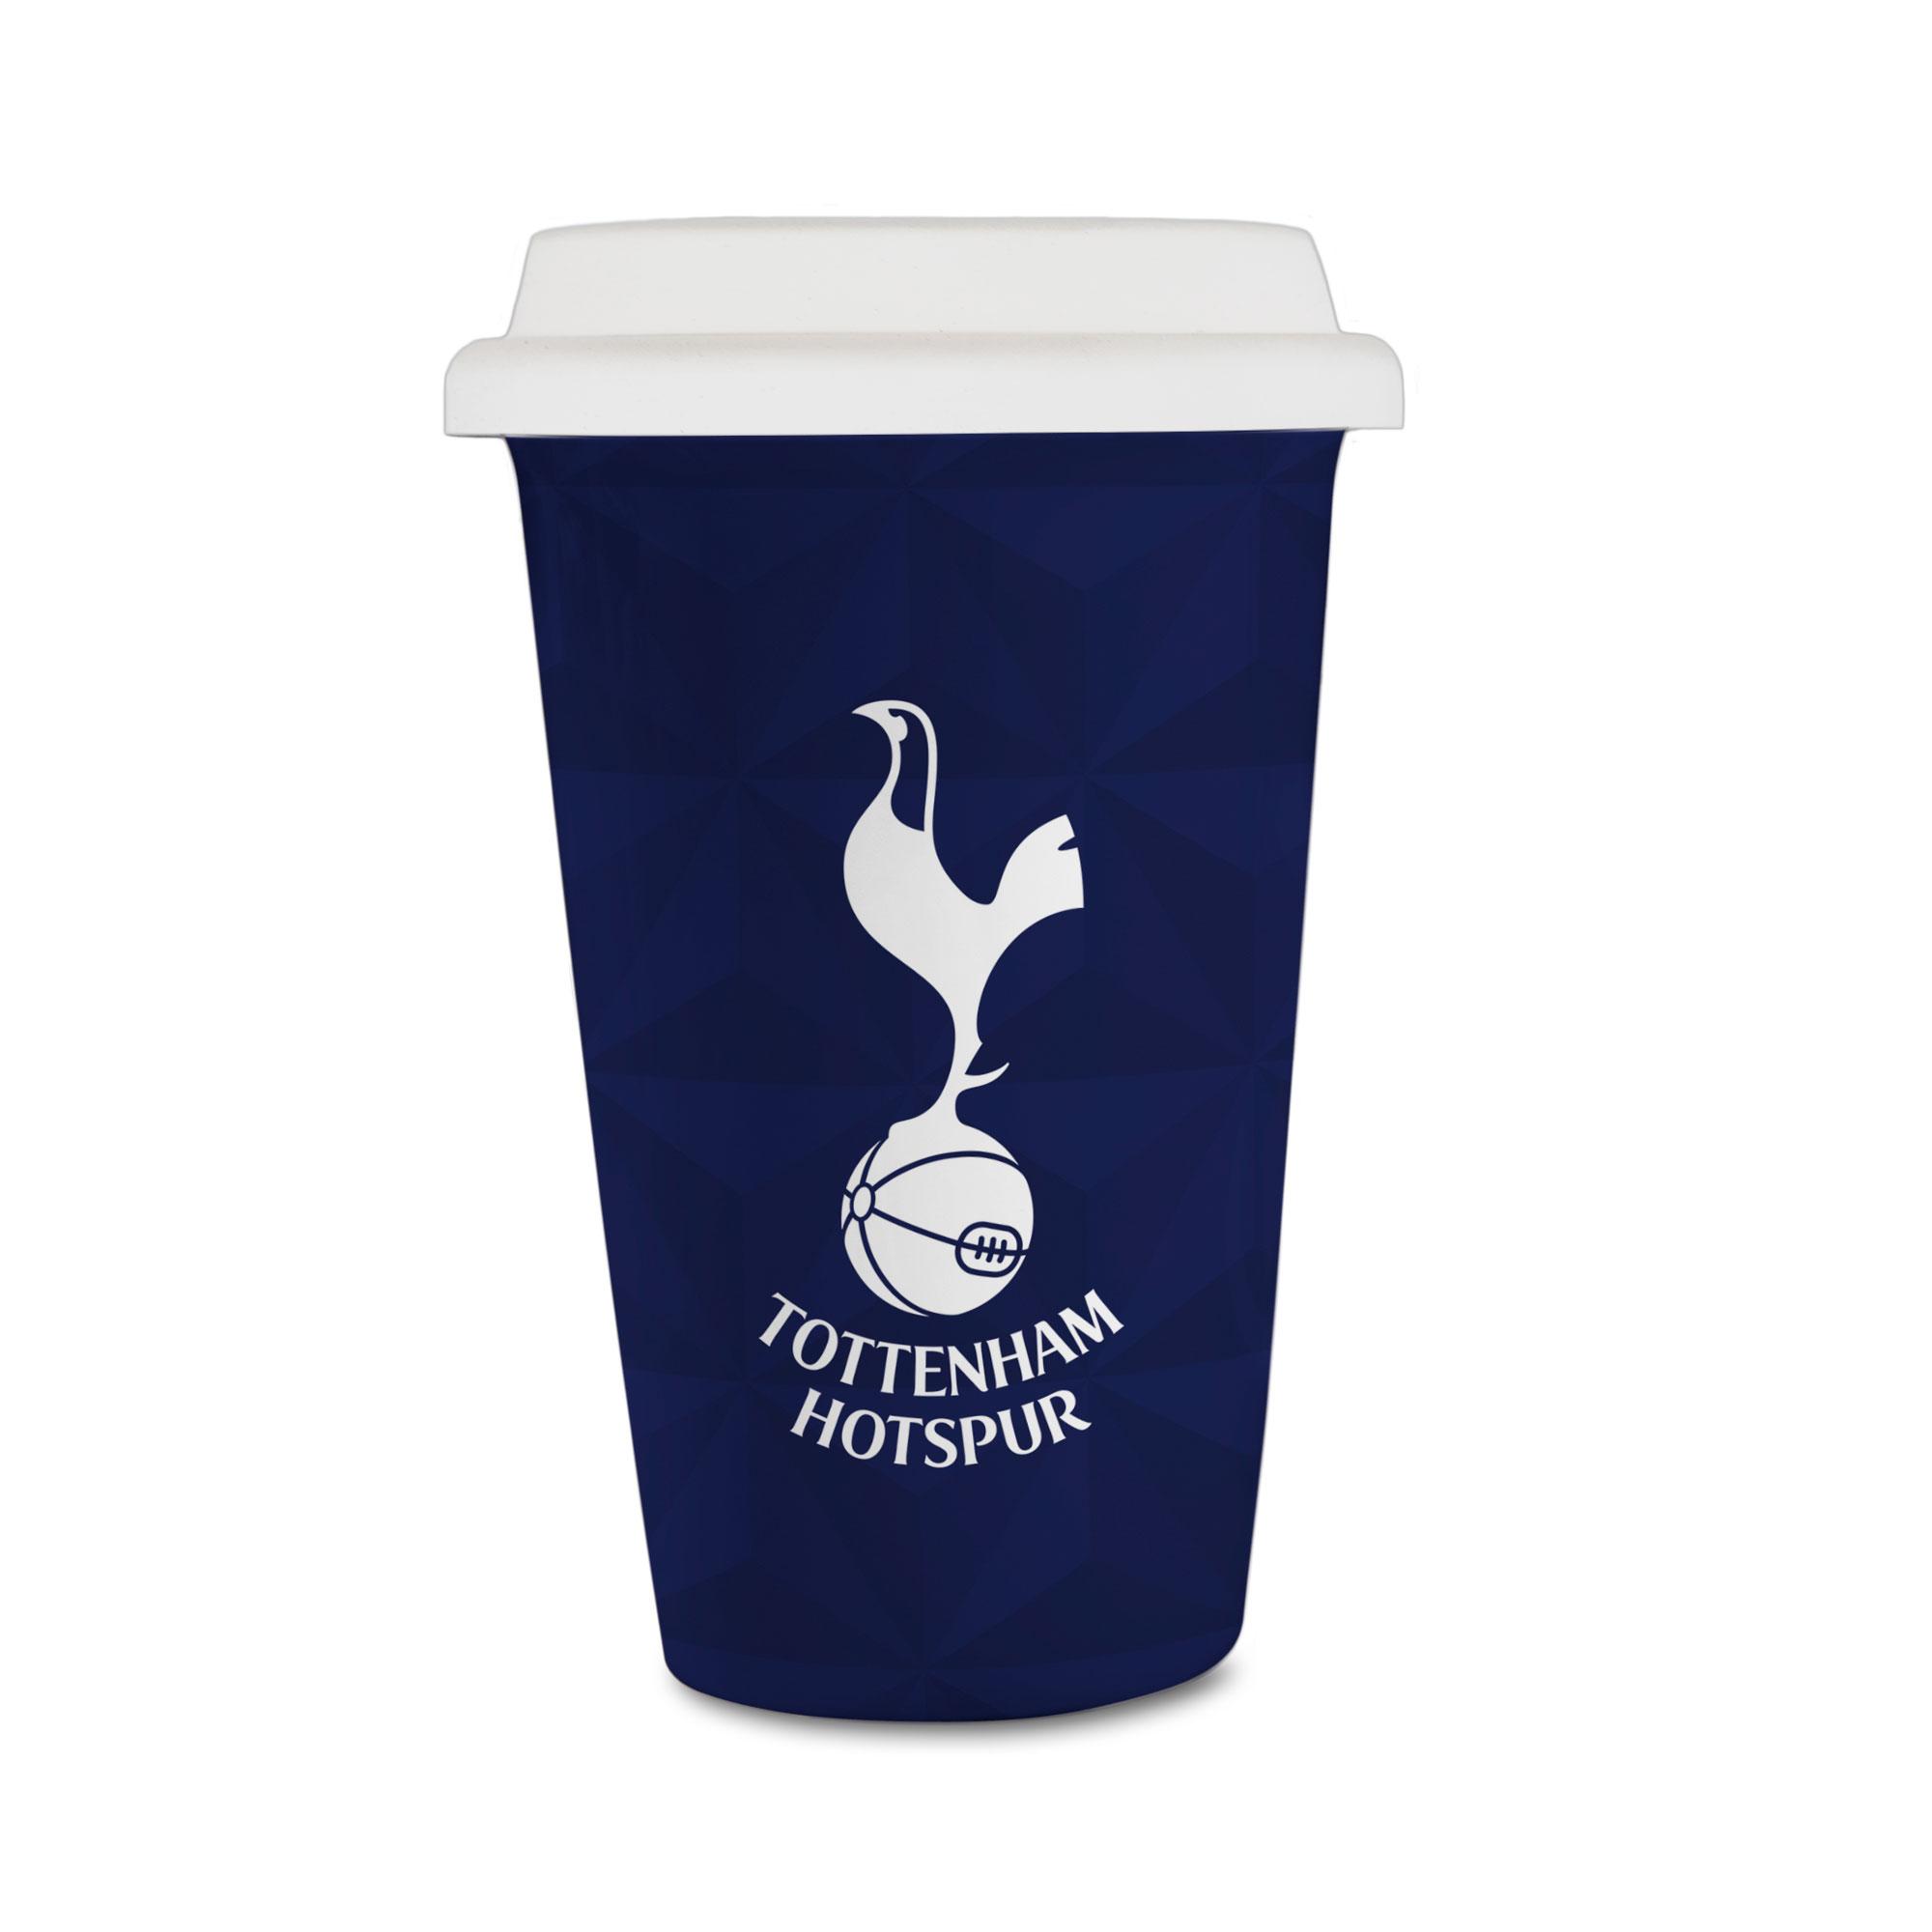 Tottenham Hotspur Crest Reusable Cup